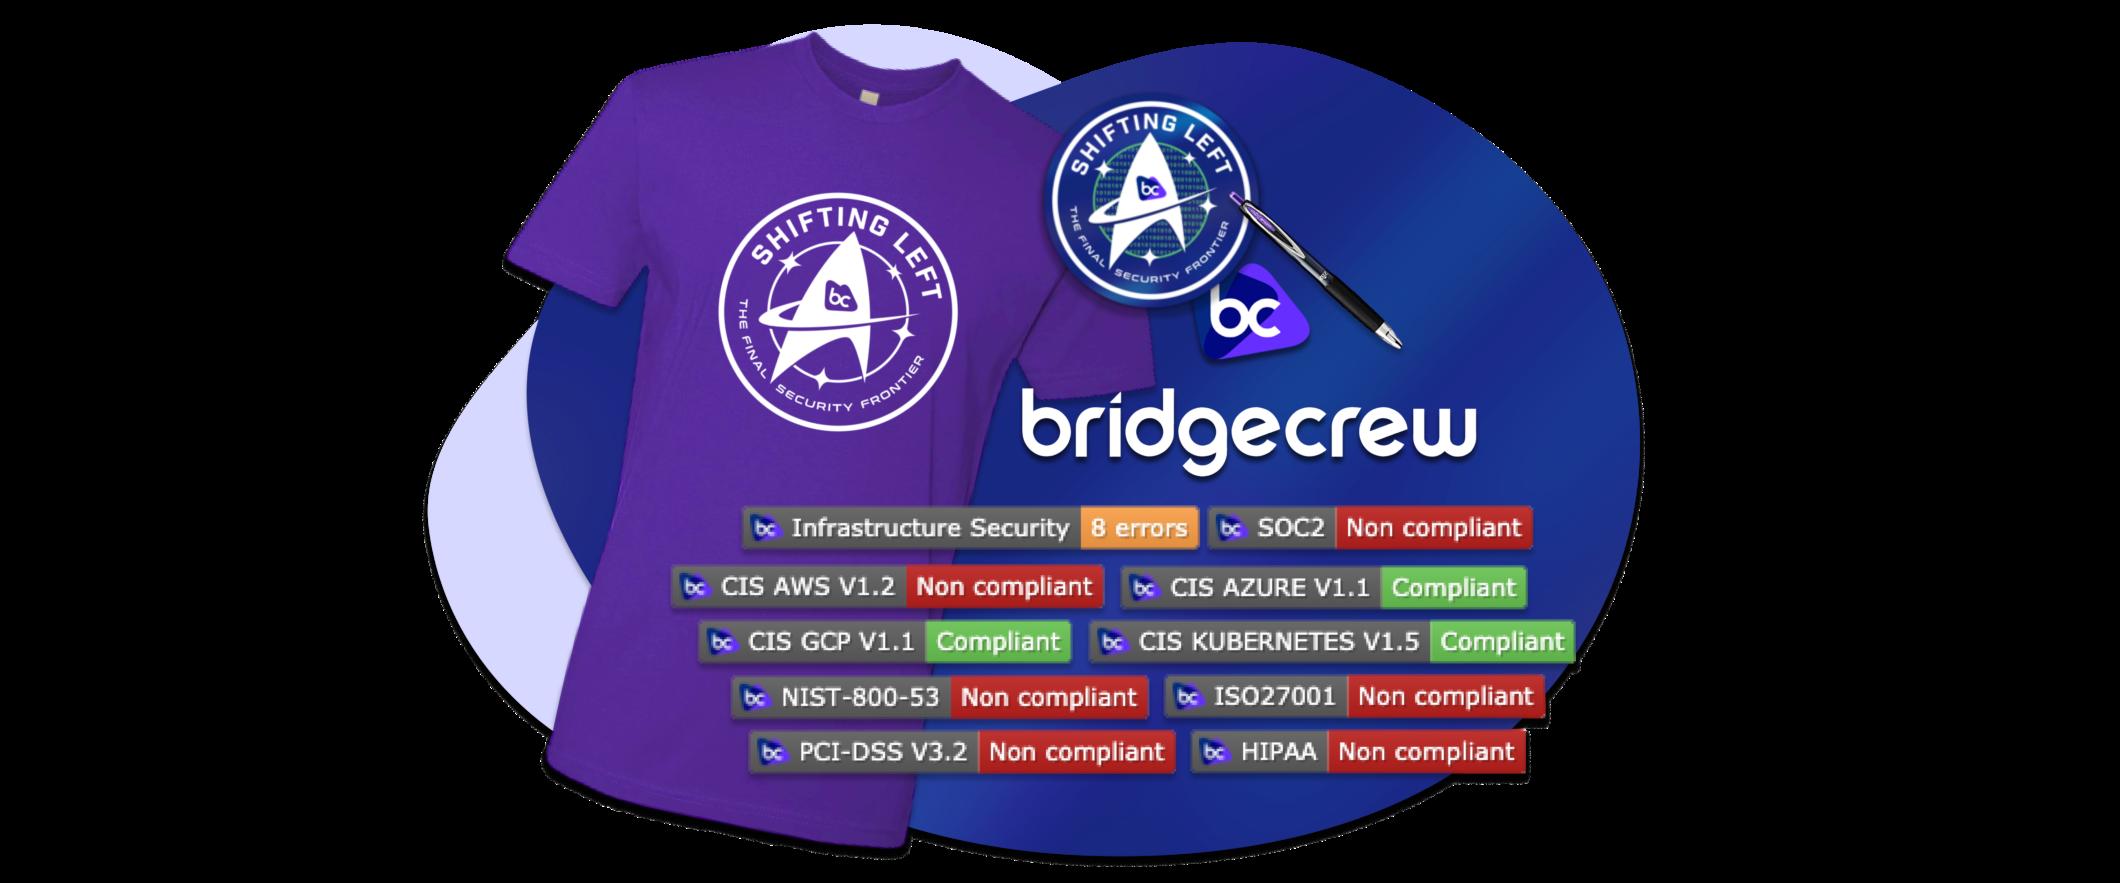 ReadMe Badges for Bridgecrew Swag